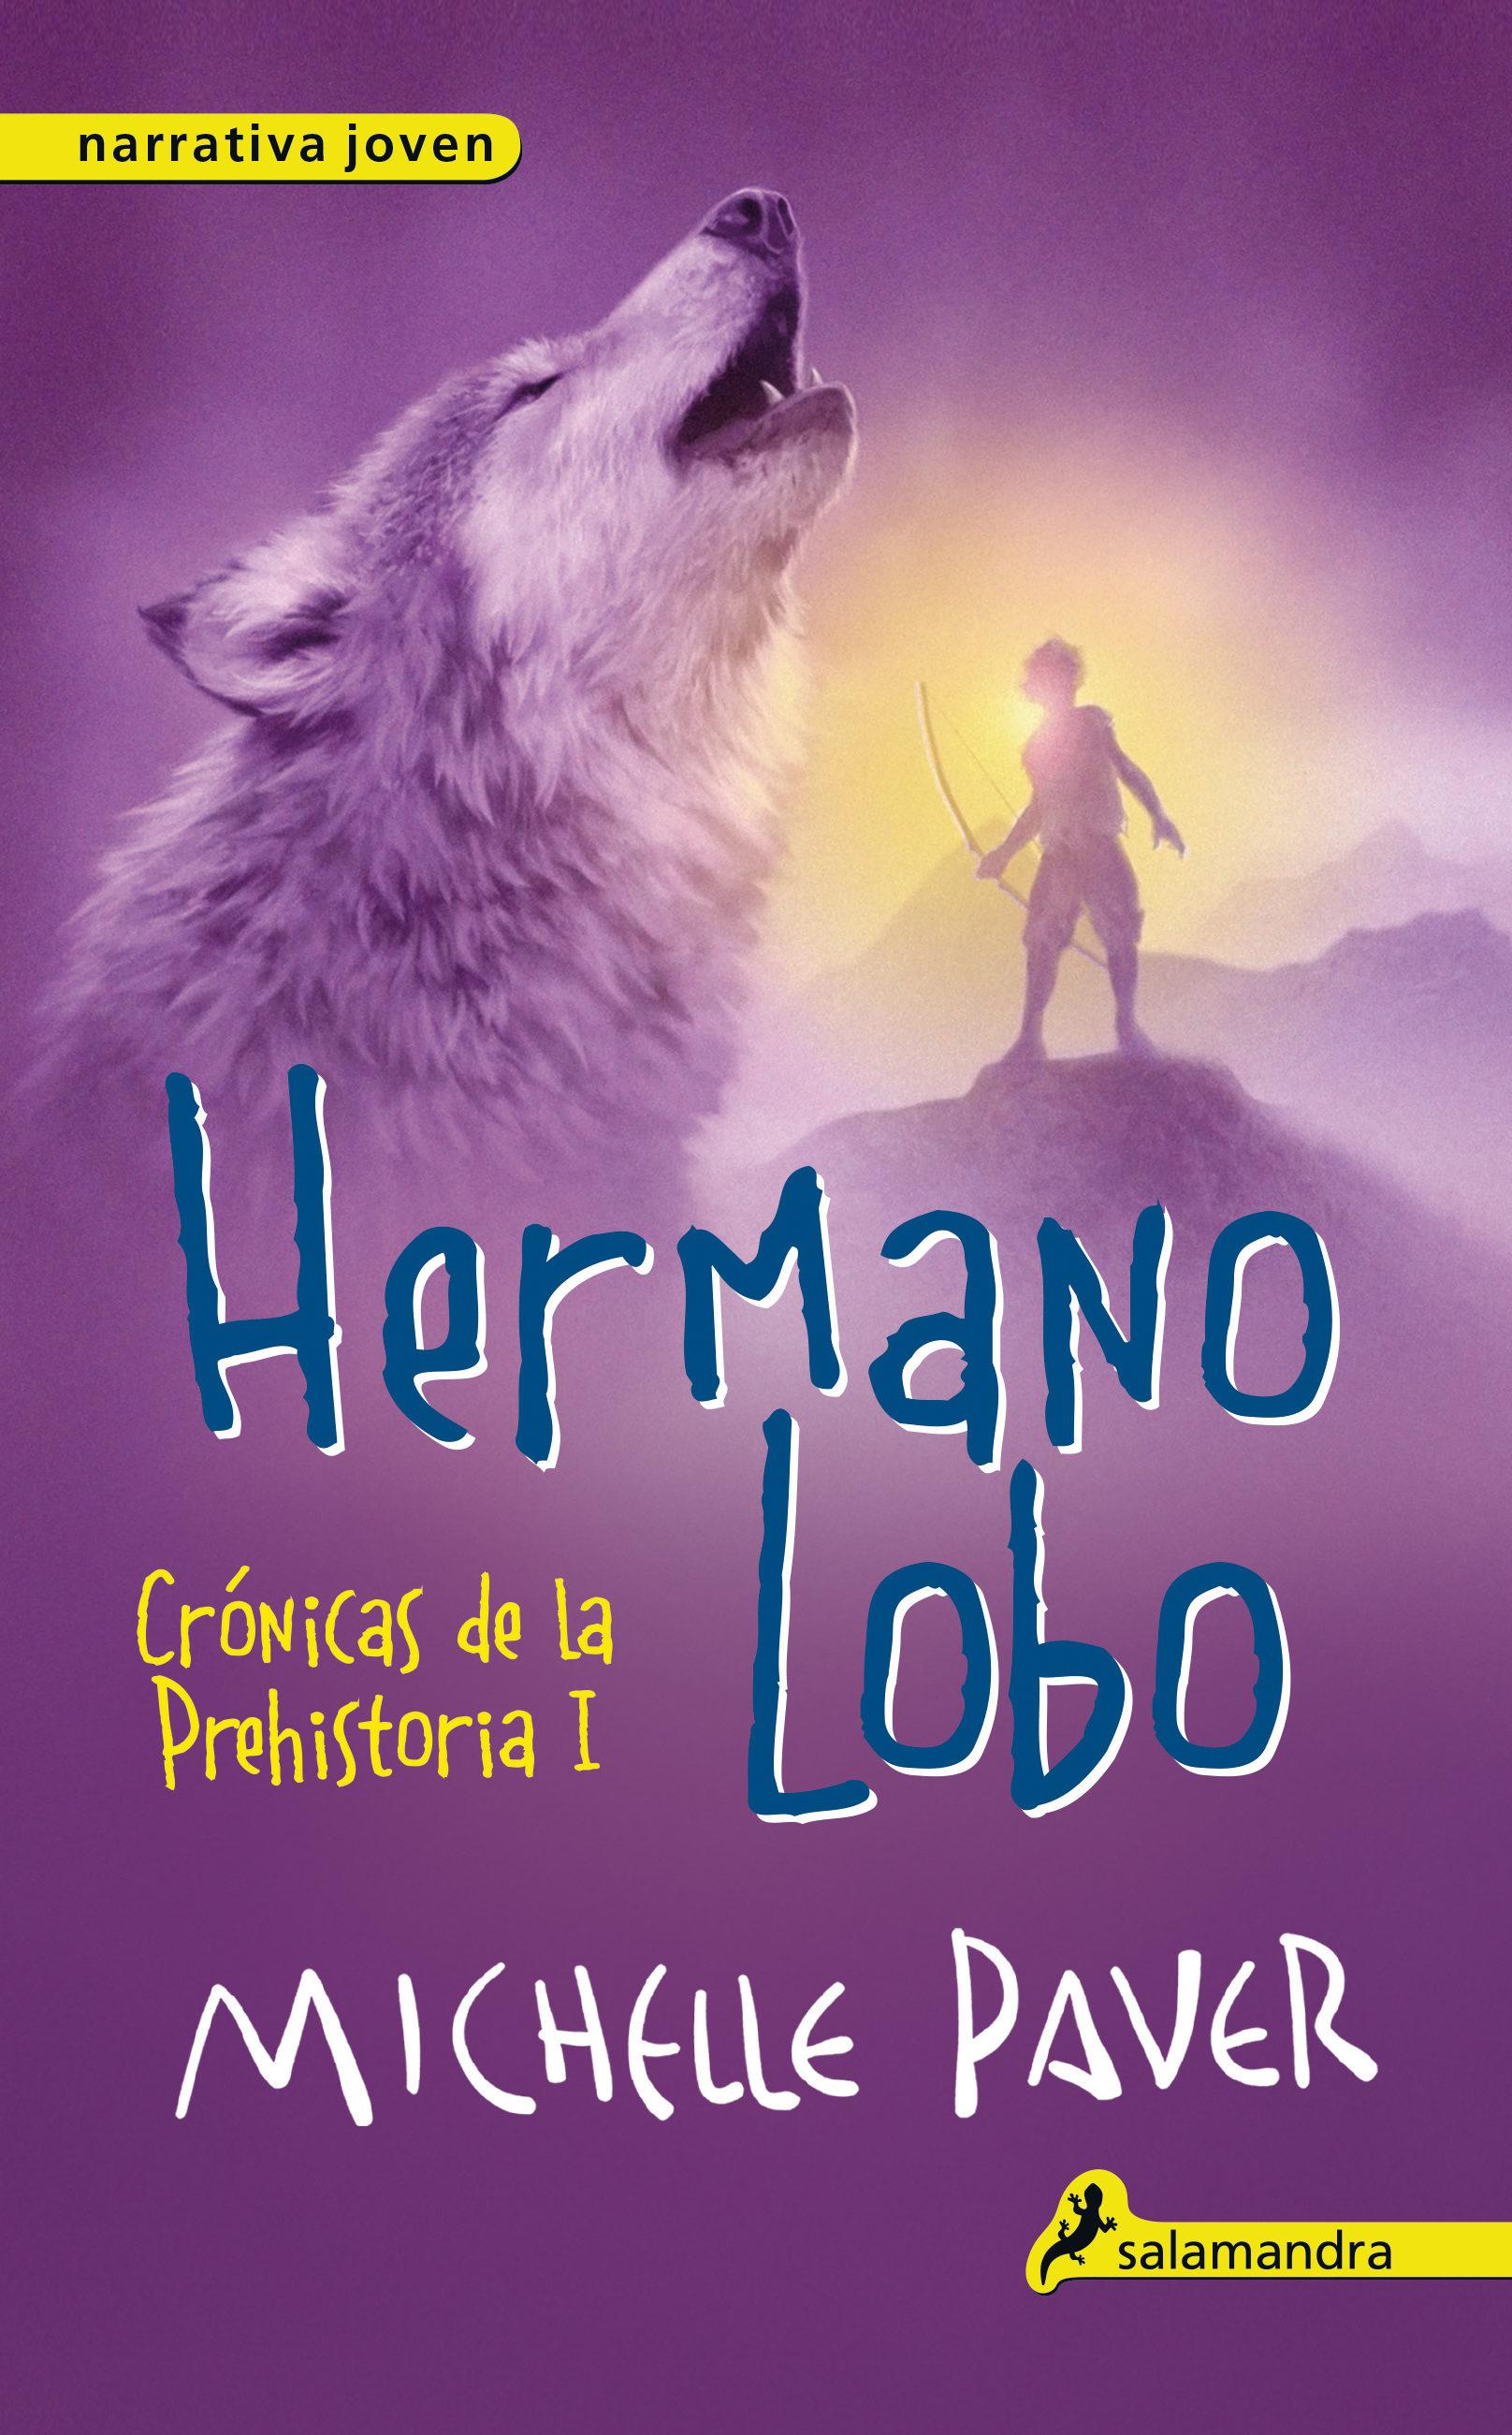 Hermano Lobo   por Michelle Paver epub